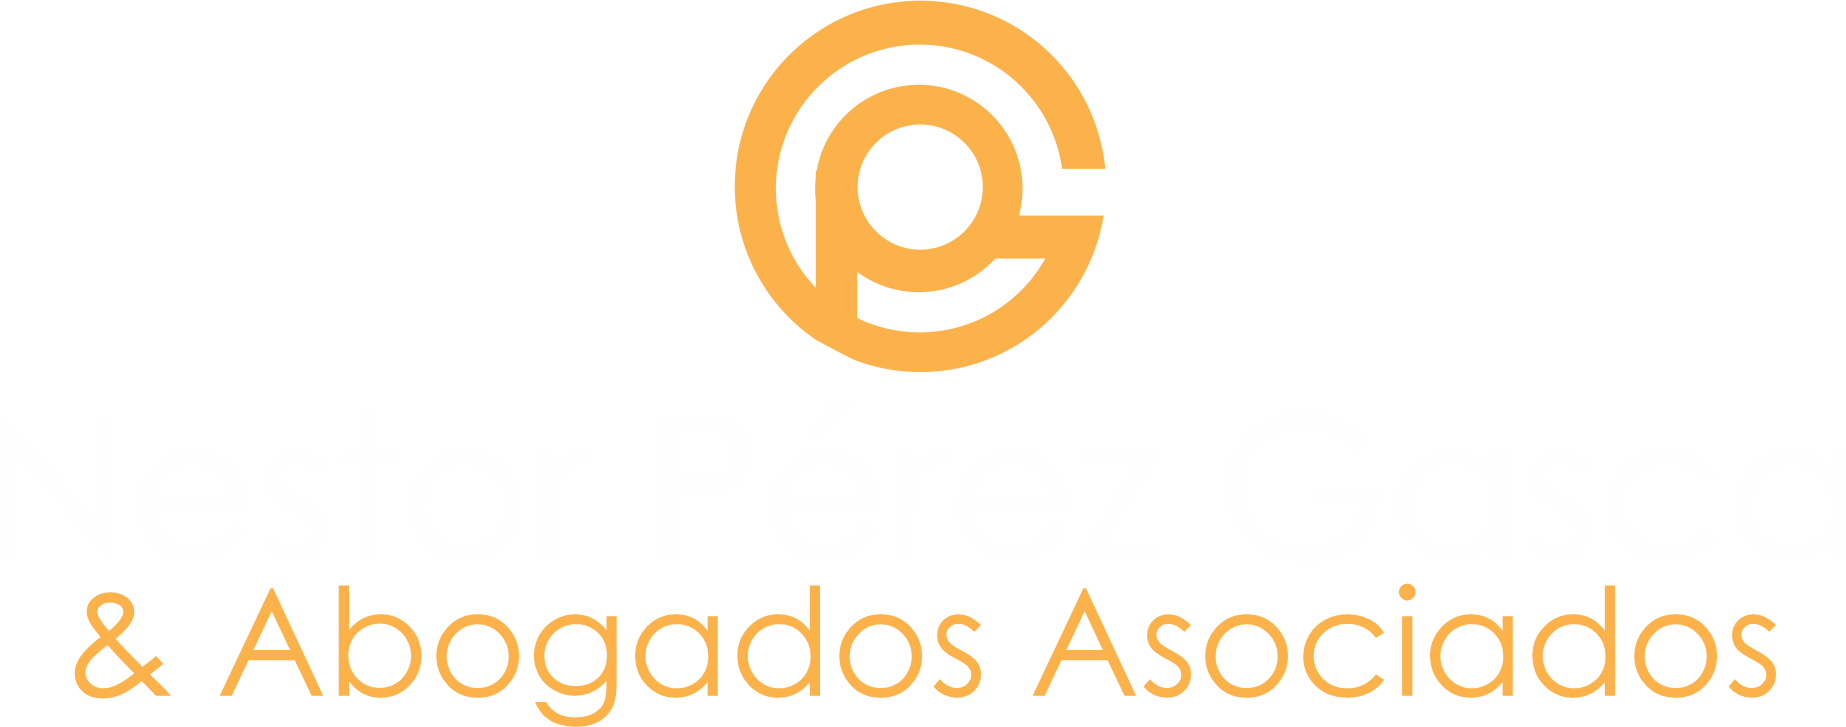 Nestor Perez